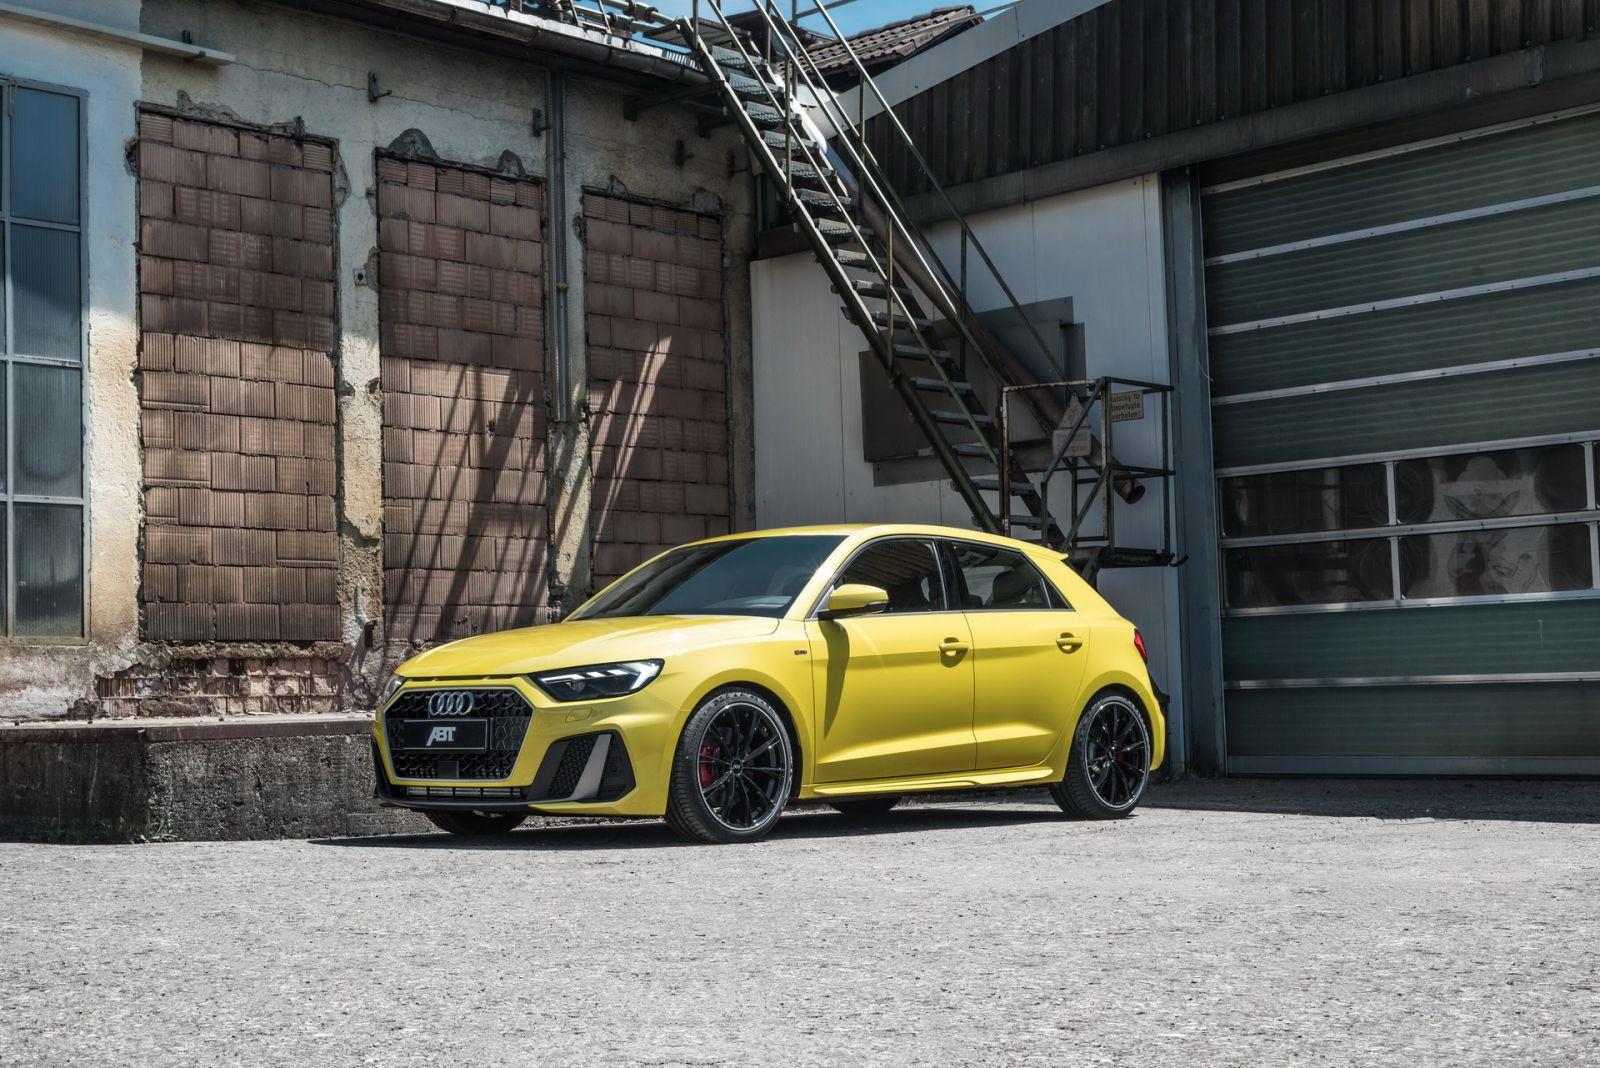 Audi A1 40 TFS ตัวใหม่ เพิ่มความแรงโดย ABT Sportsline 1